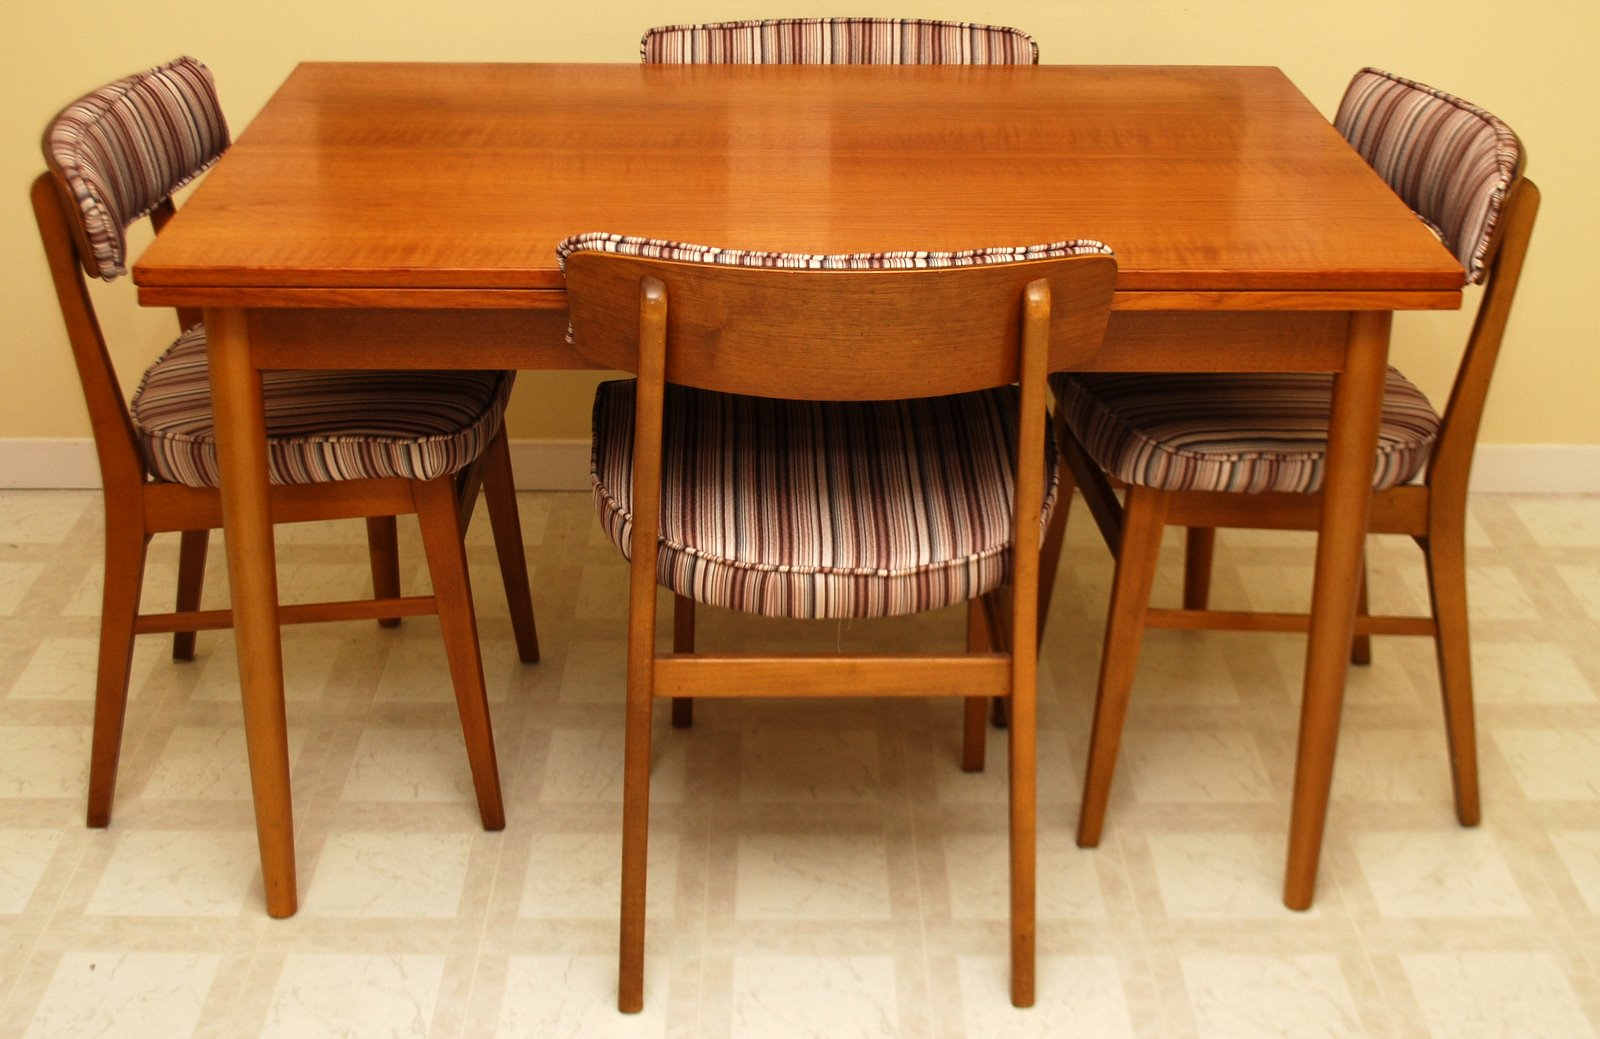 Tribute 20th Decor MidCentury Modern Danish Teak Dining Table